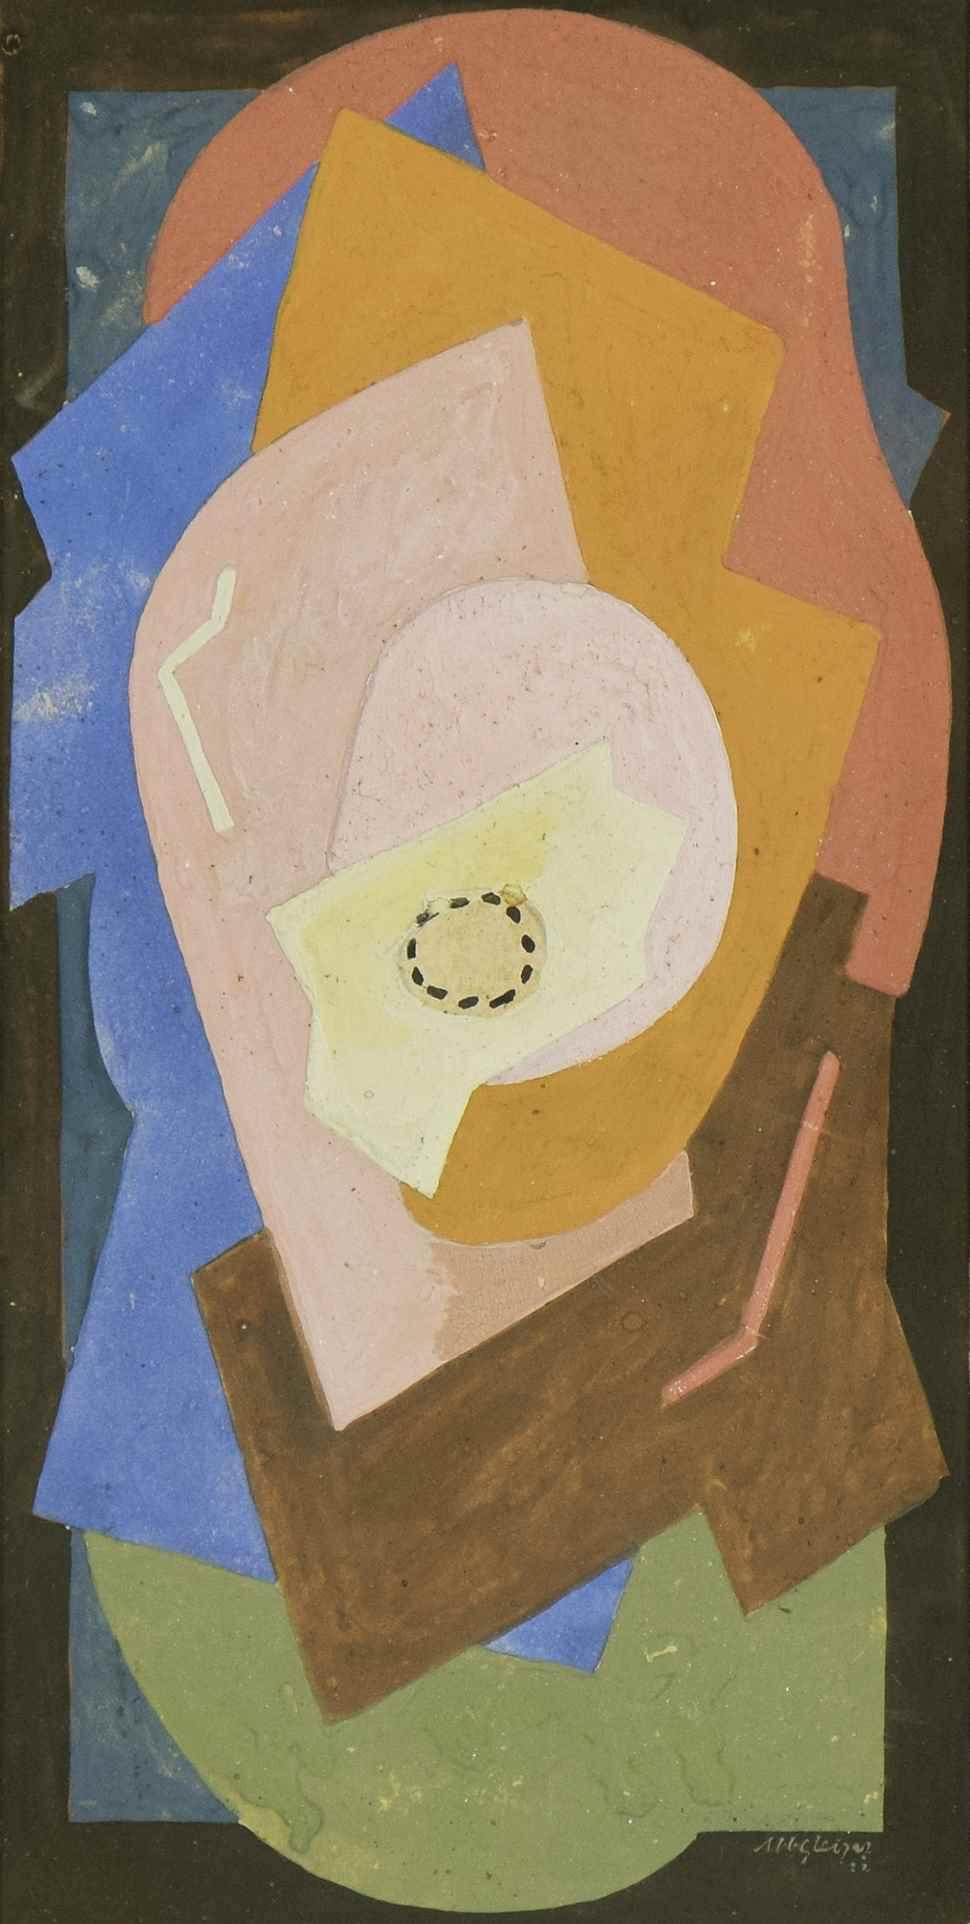 Composition - Albert Gleizes (1881 - 1953)